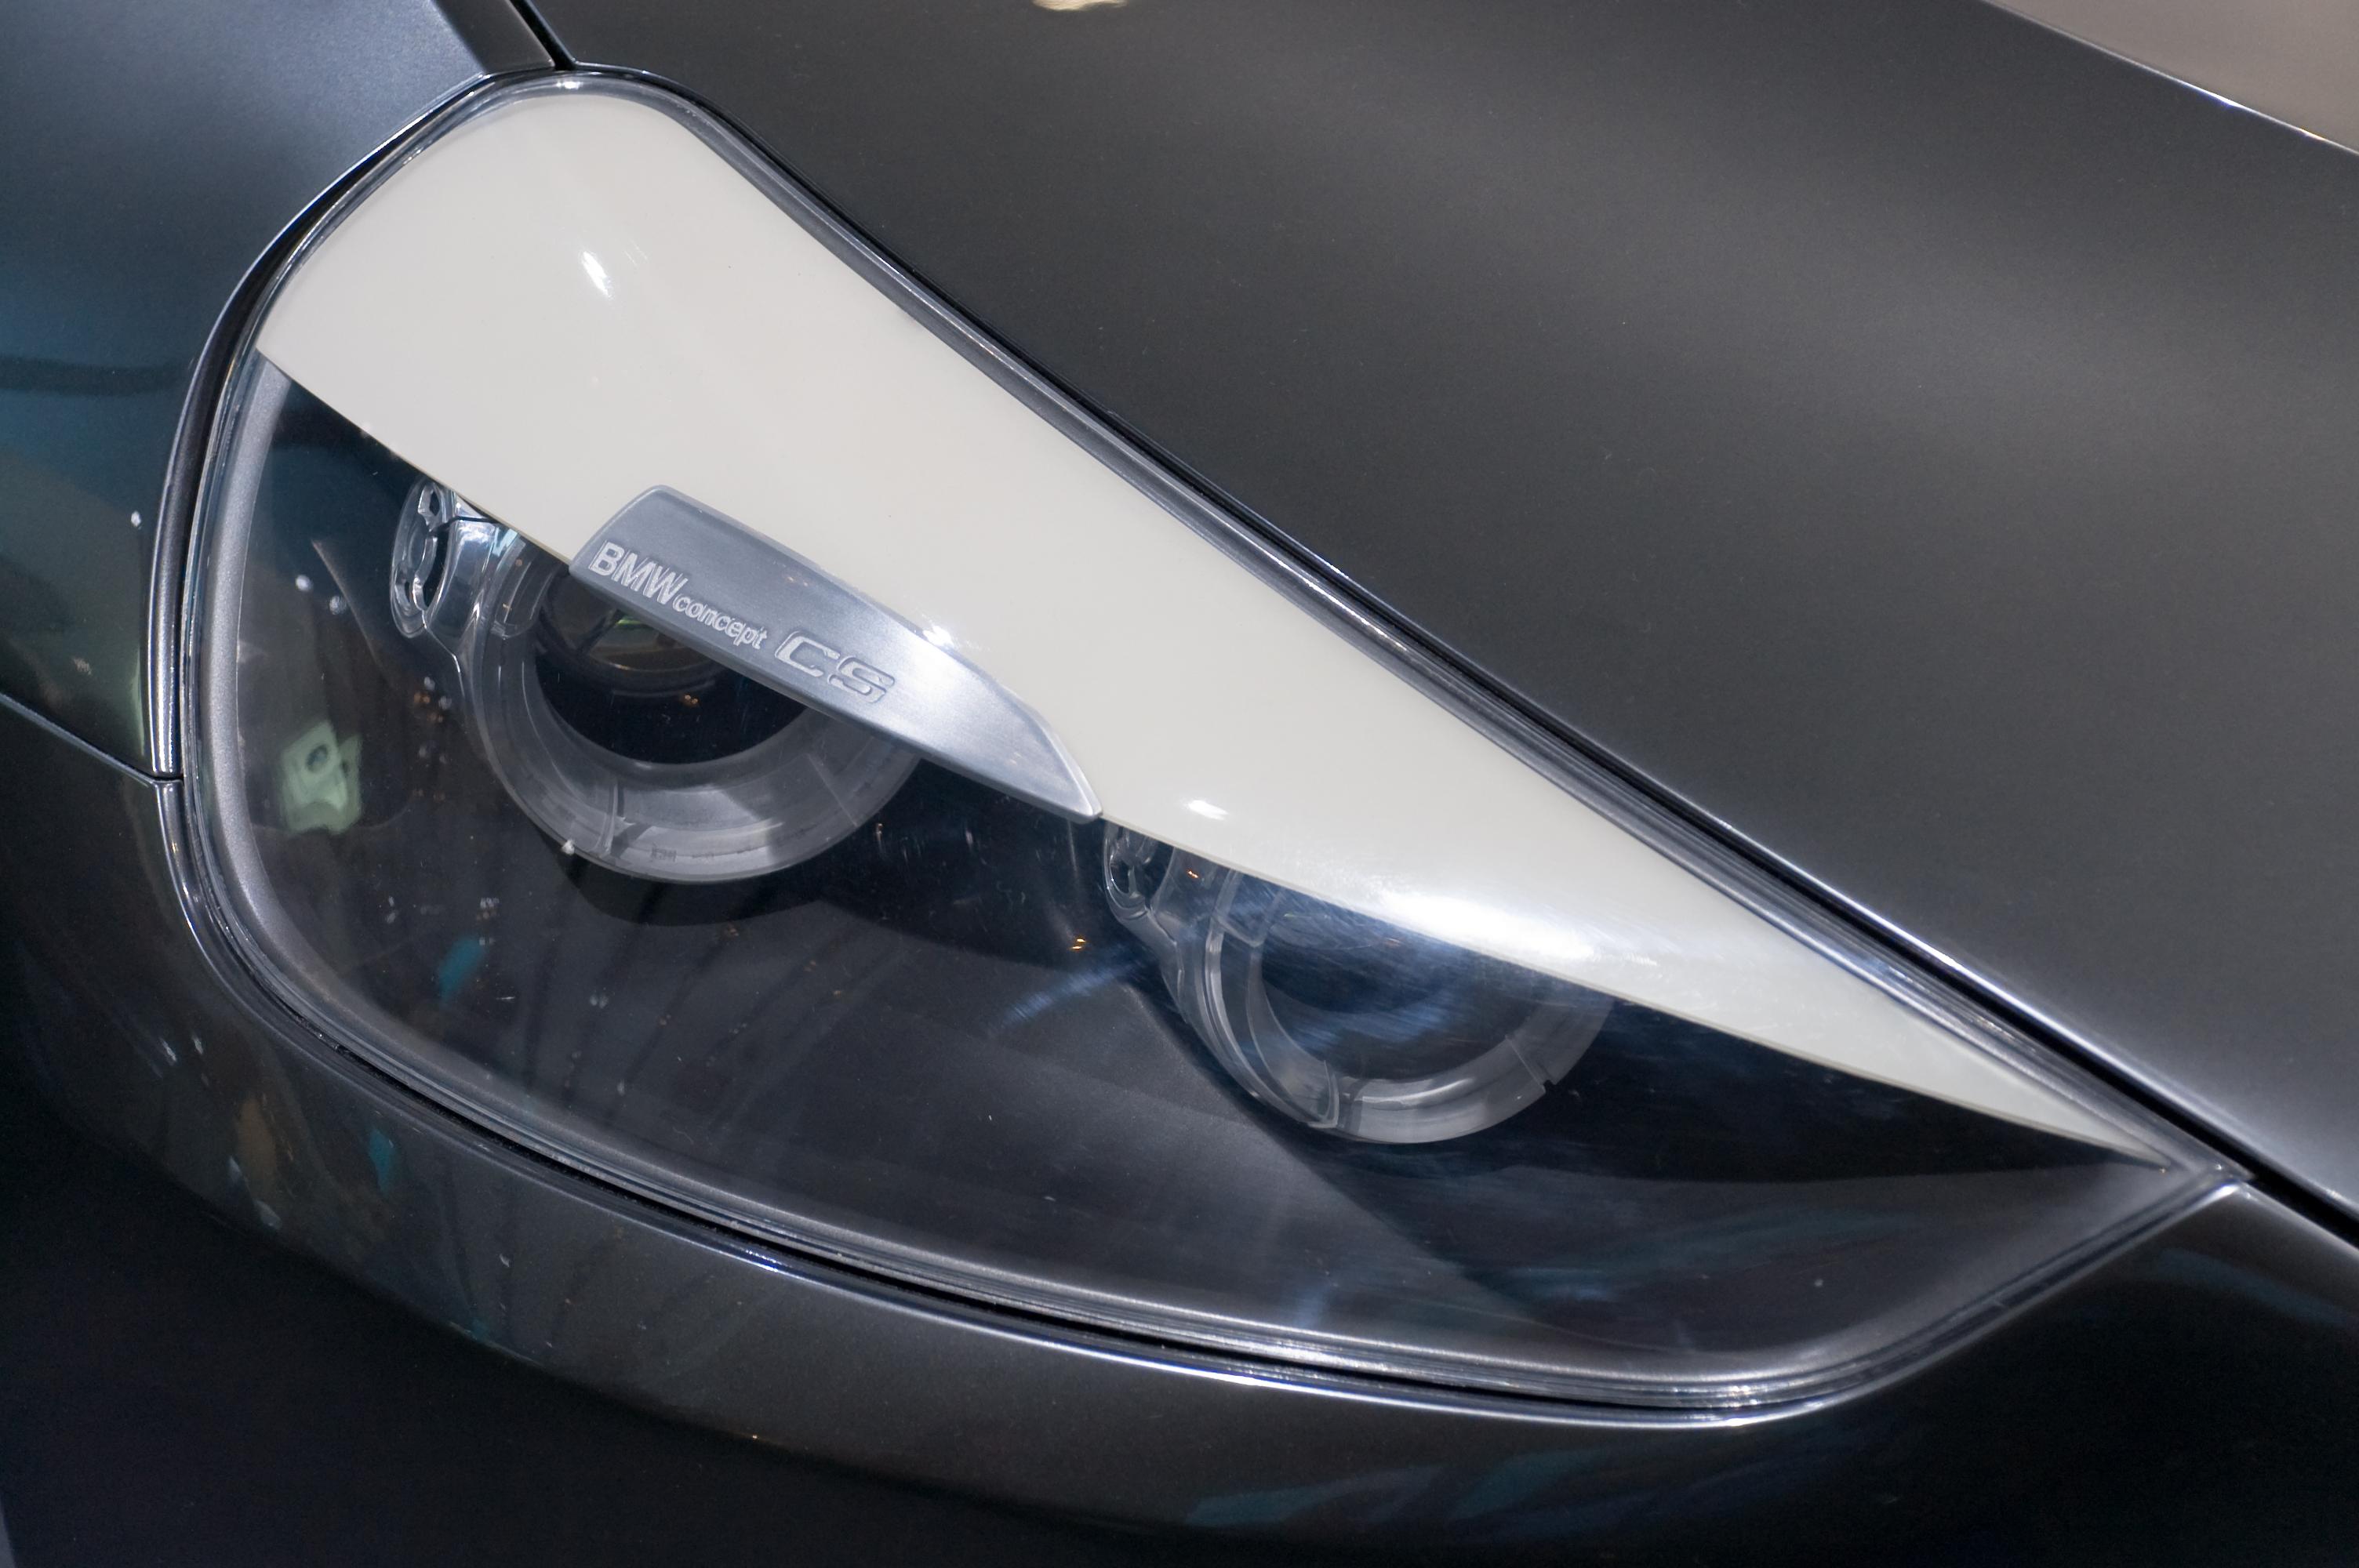 File:BMW Concept CS headlight.jpg - Wikimedia Commons